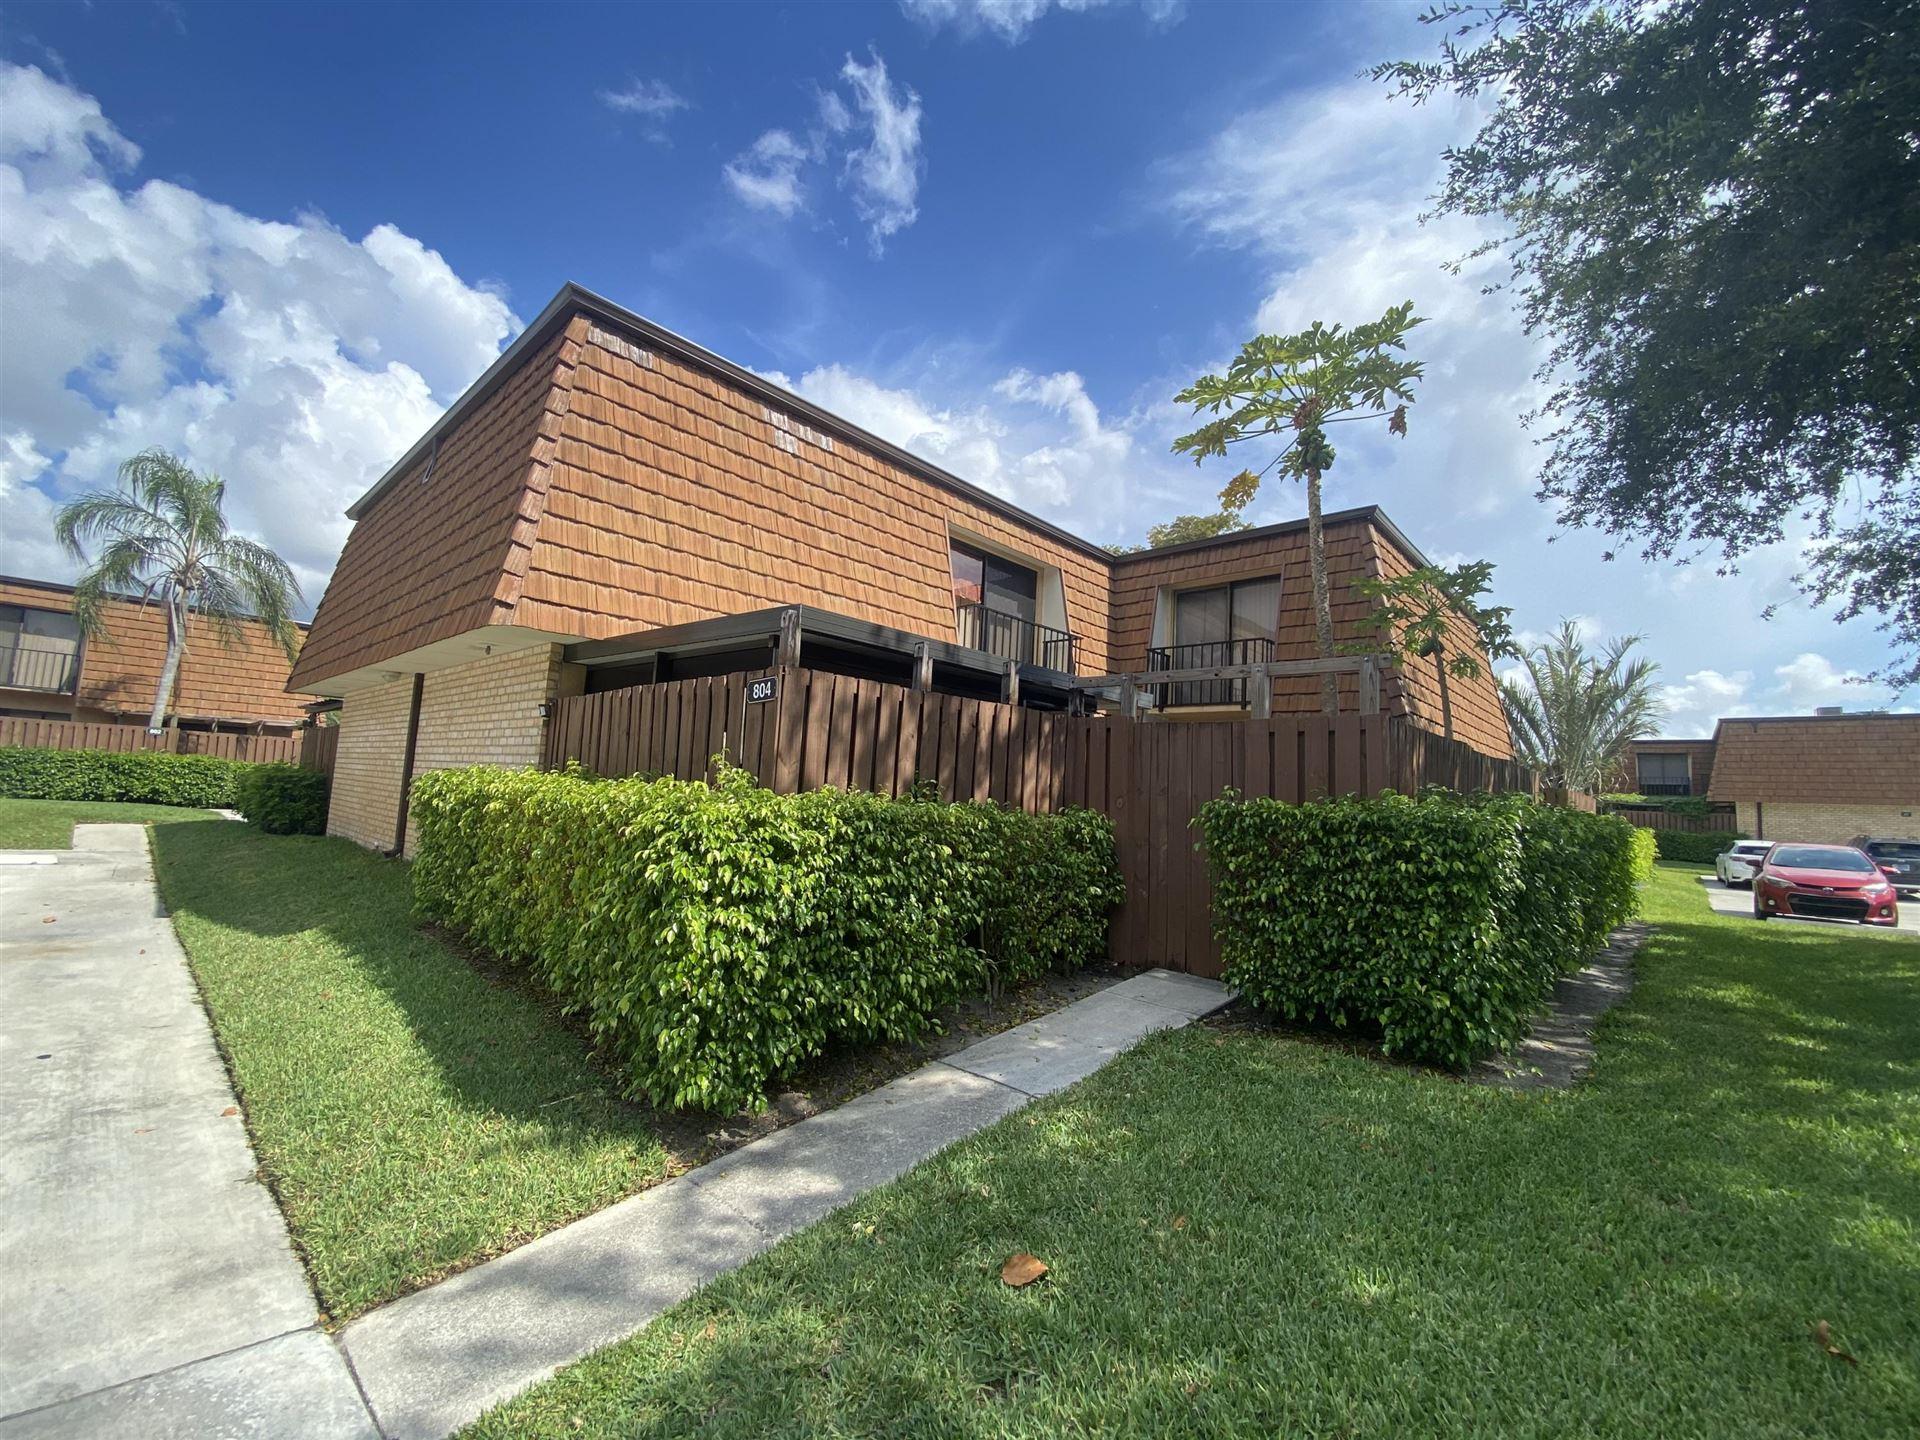 804 8th Lane #D, Greenacres, FL 33463 - MLS#: RX-10720775